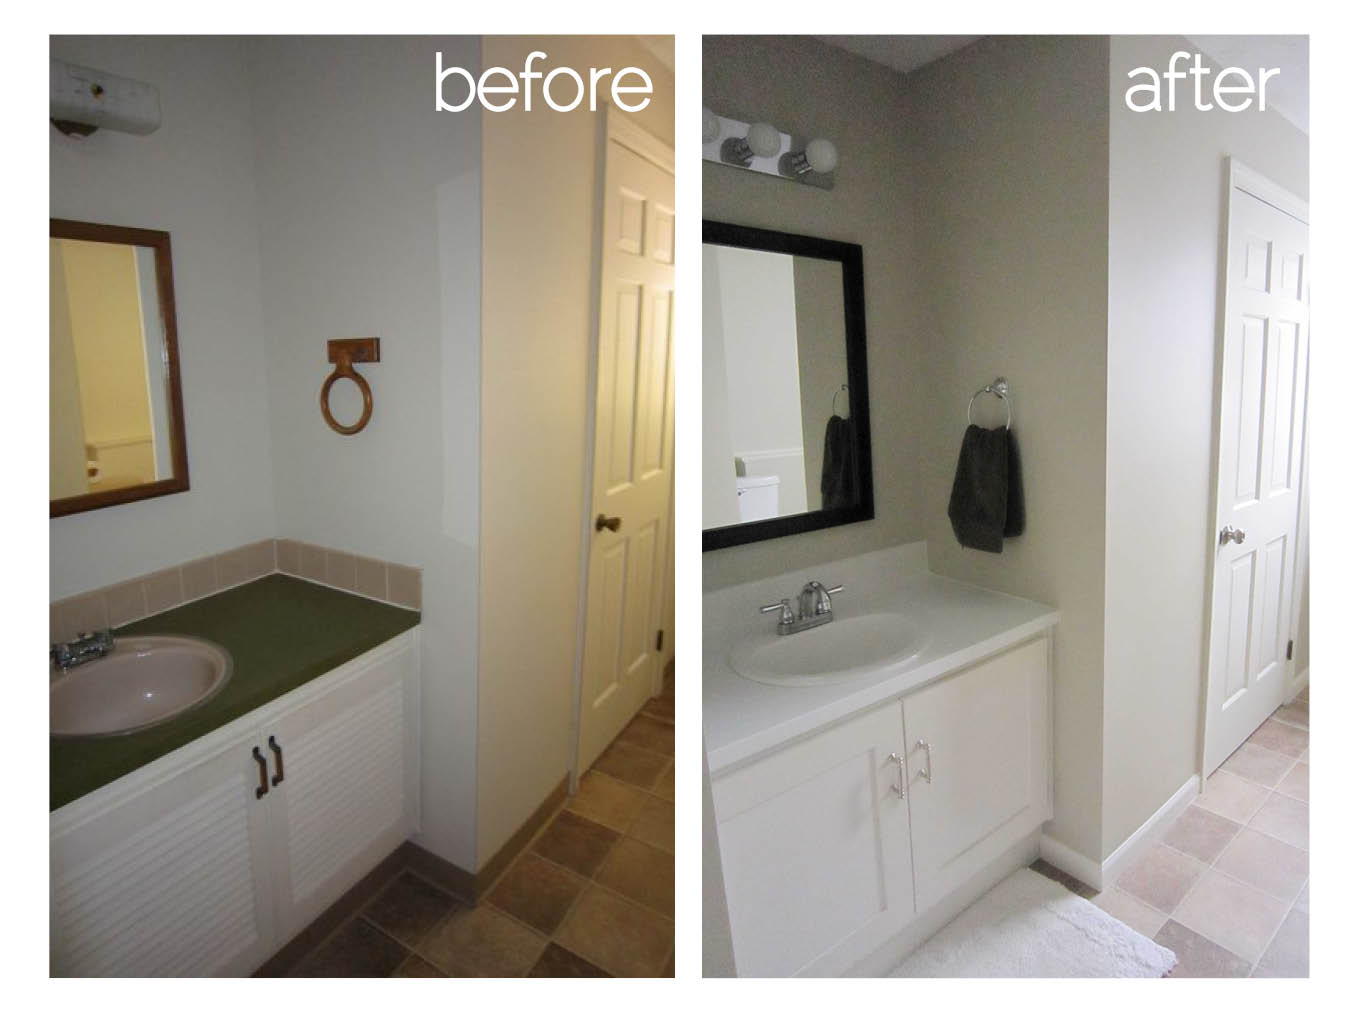 Diy Bathroom Remodel Before And After bathroom renovation before and after photos - bathrooms cabinets